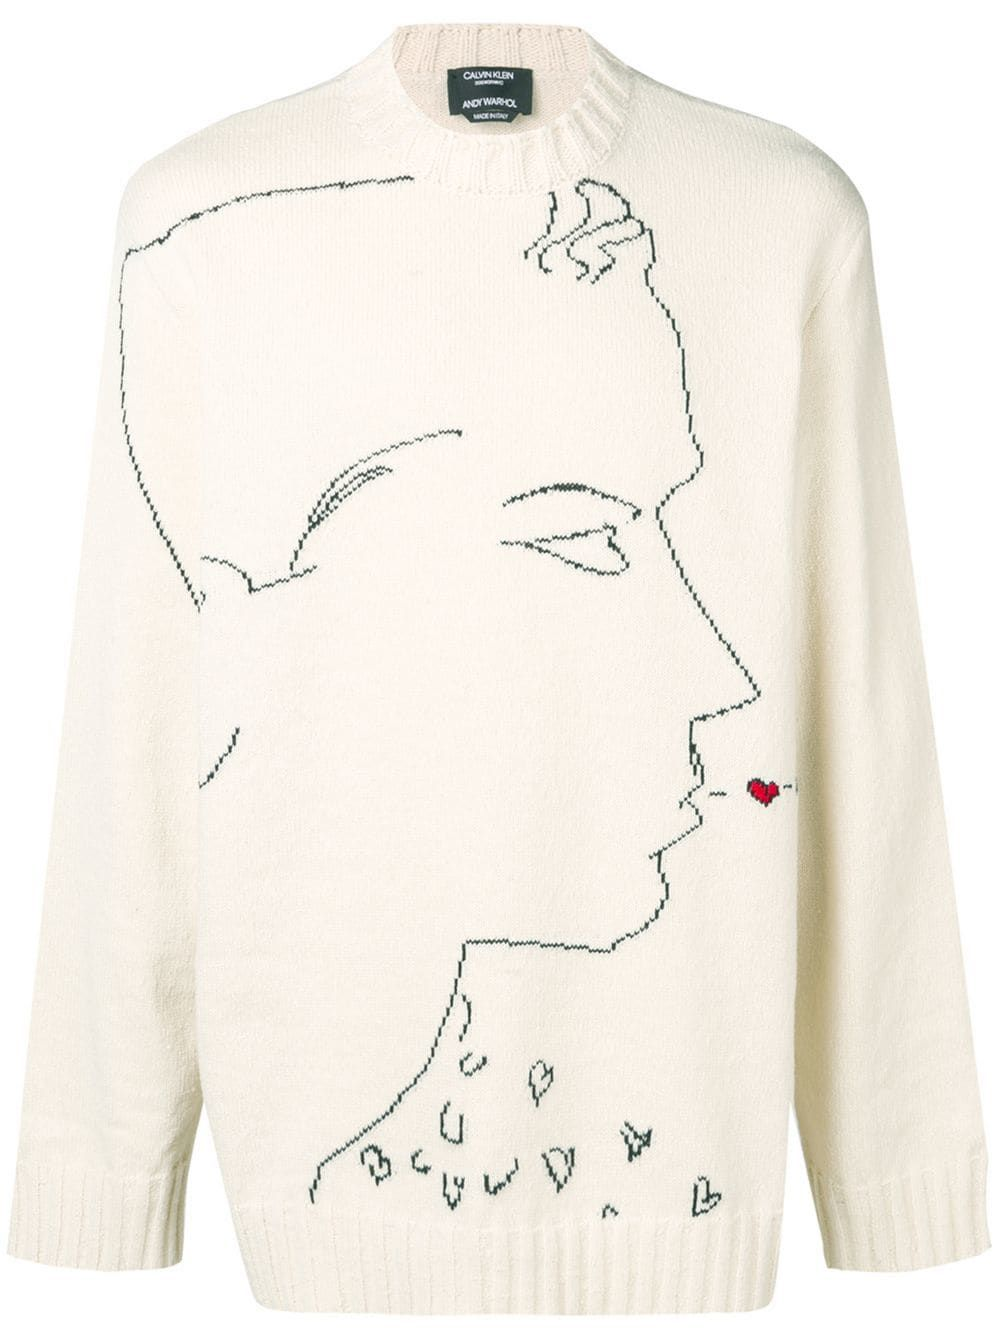 fd72edf5a Calvin Klein 205W39nyc profile print knit sweater - Neutrals in 2019 ...